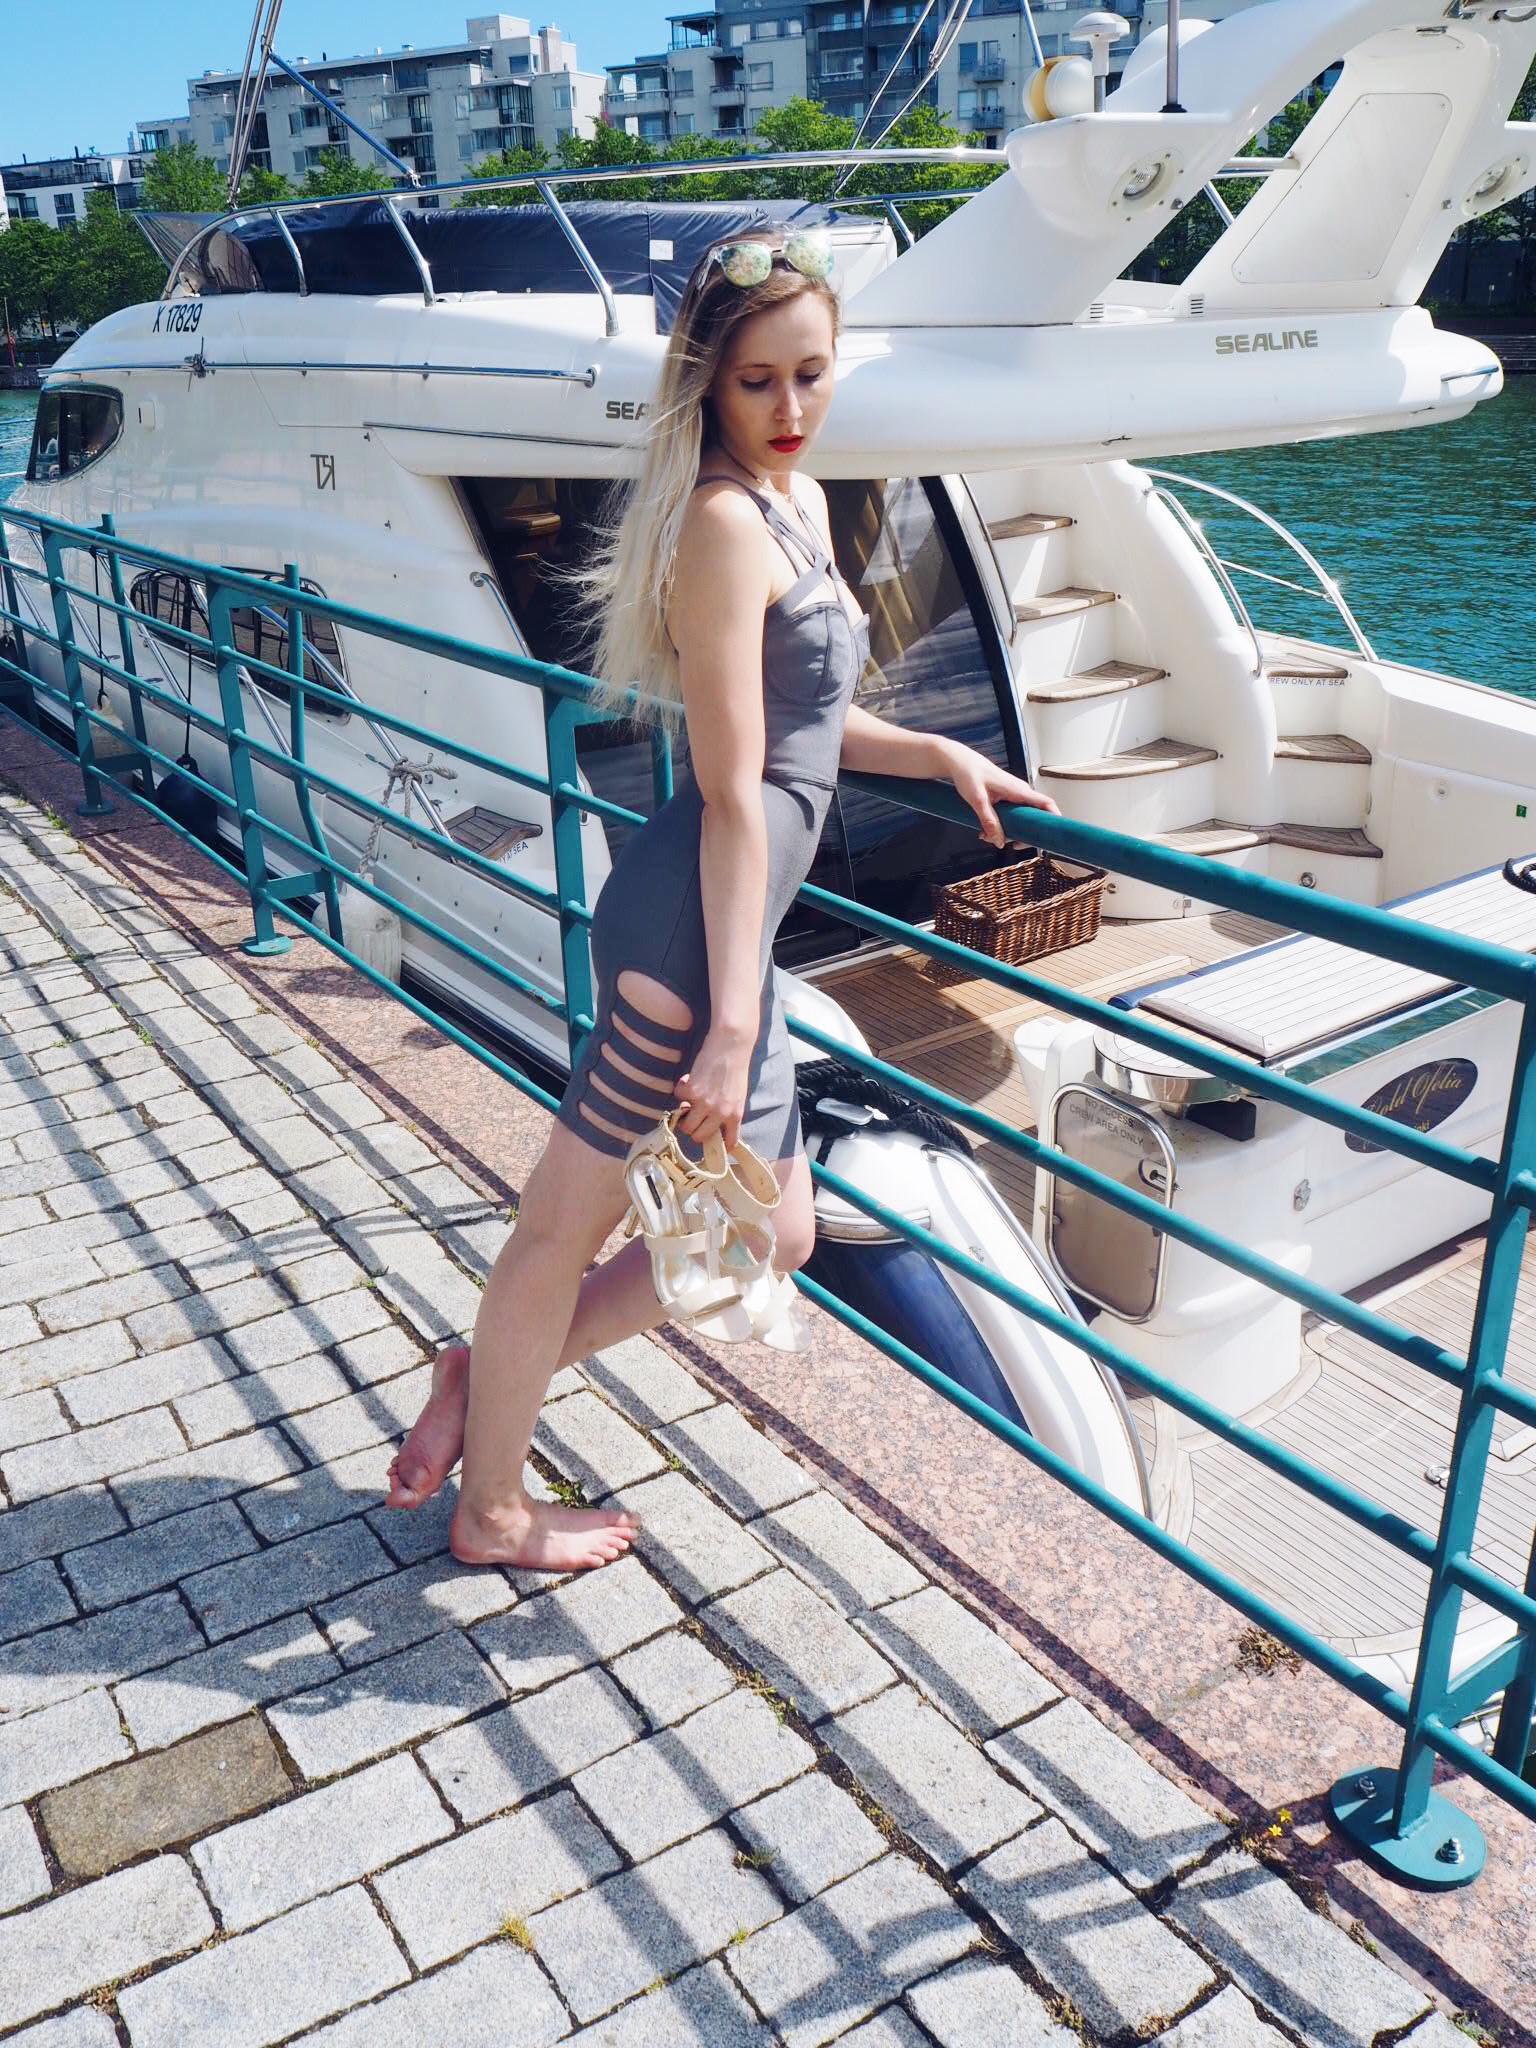 yachtmodel-3.jpg